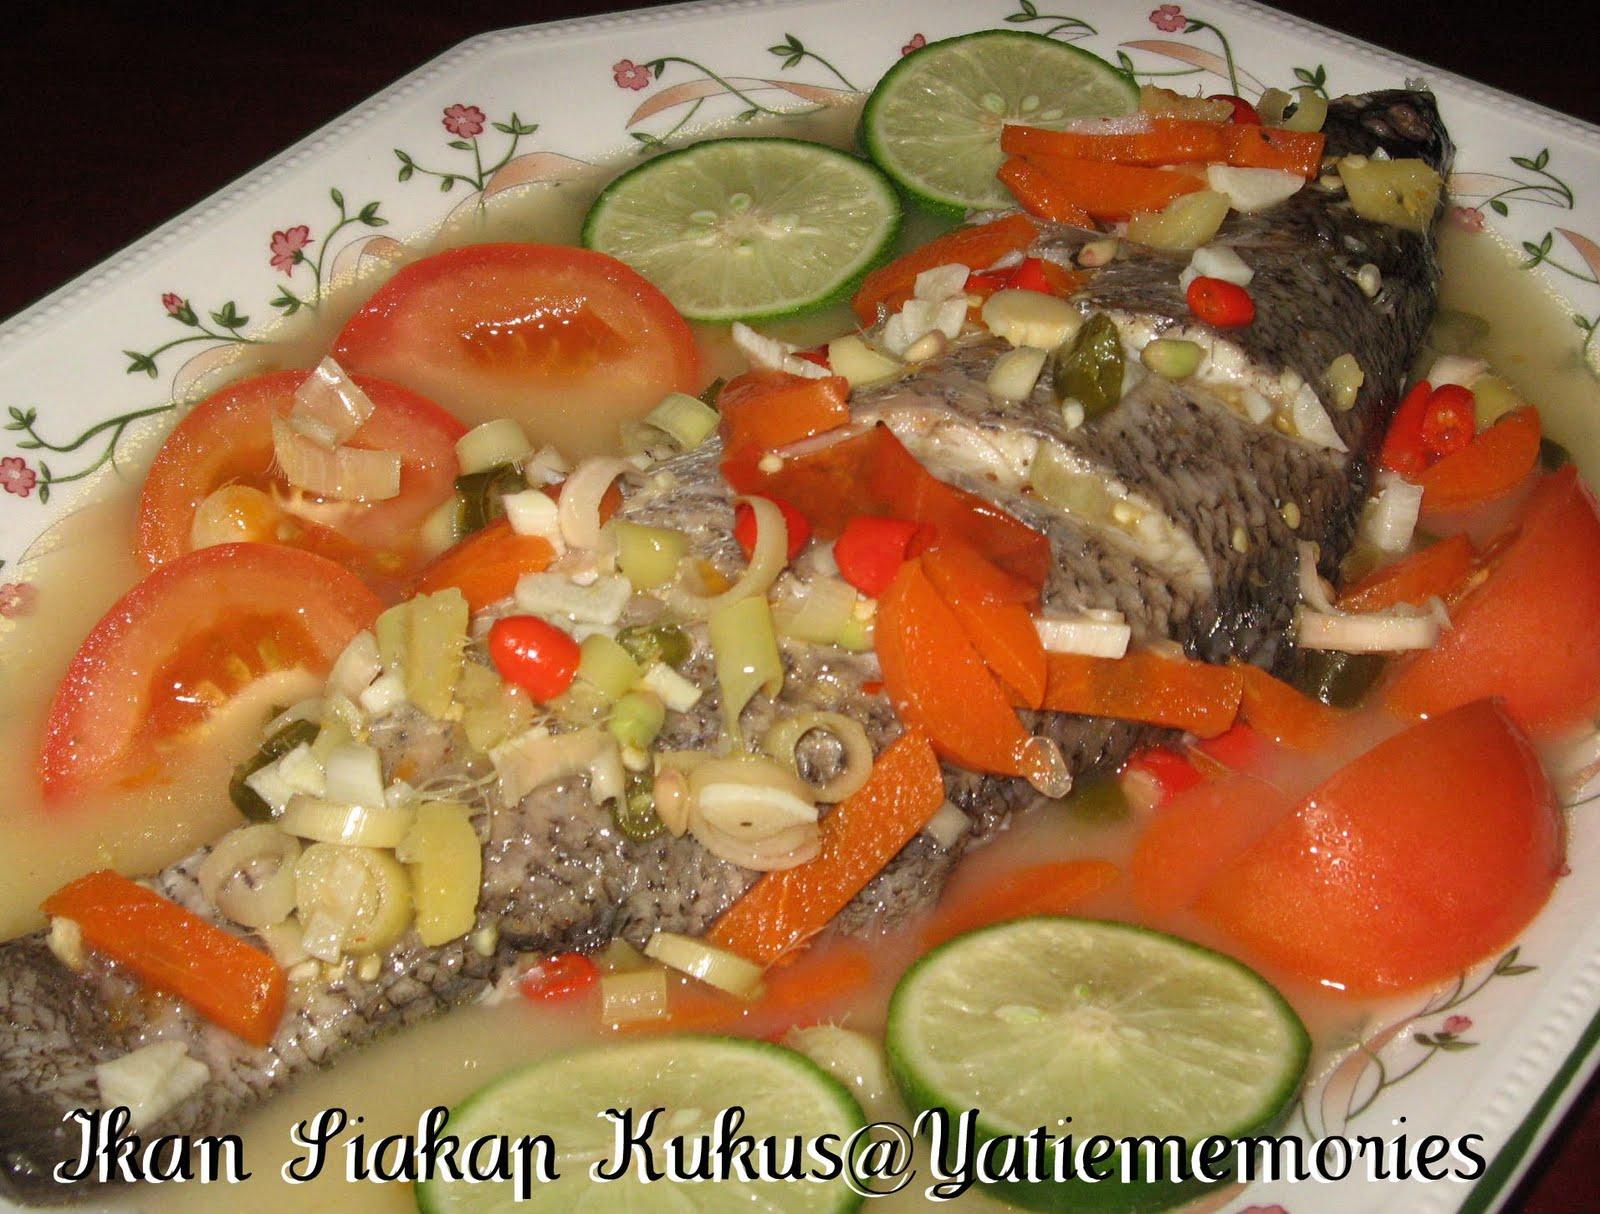 http://4.bp.blogspot.com/_cFUZn0lwQ4k/TPNi3PmSquI/AAAAAAAACic/05Ye5_i5vjI/s1600/IMG_0686e.jpg